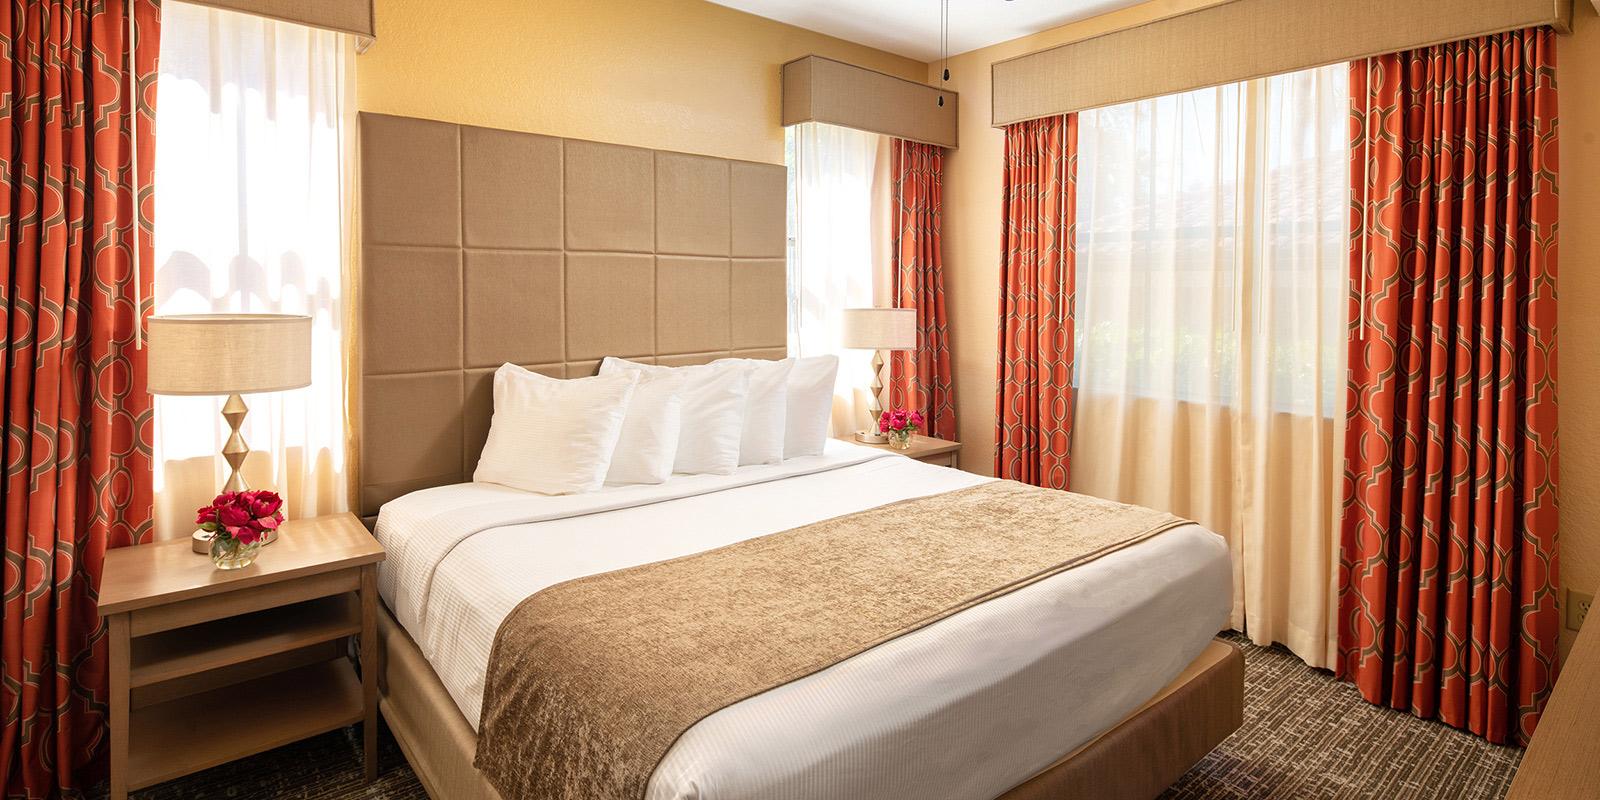 Three Bedroom Apartment Style Suites in Orlando, FL | Floridays ...